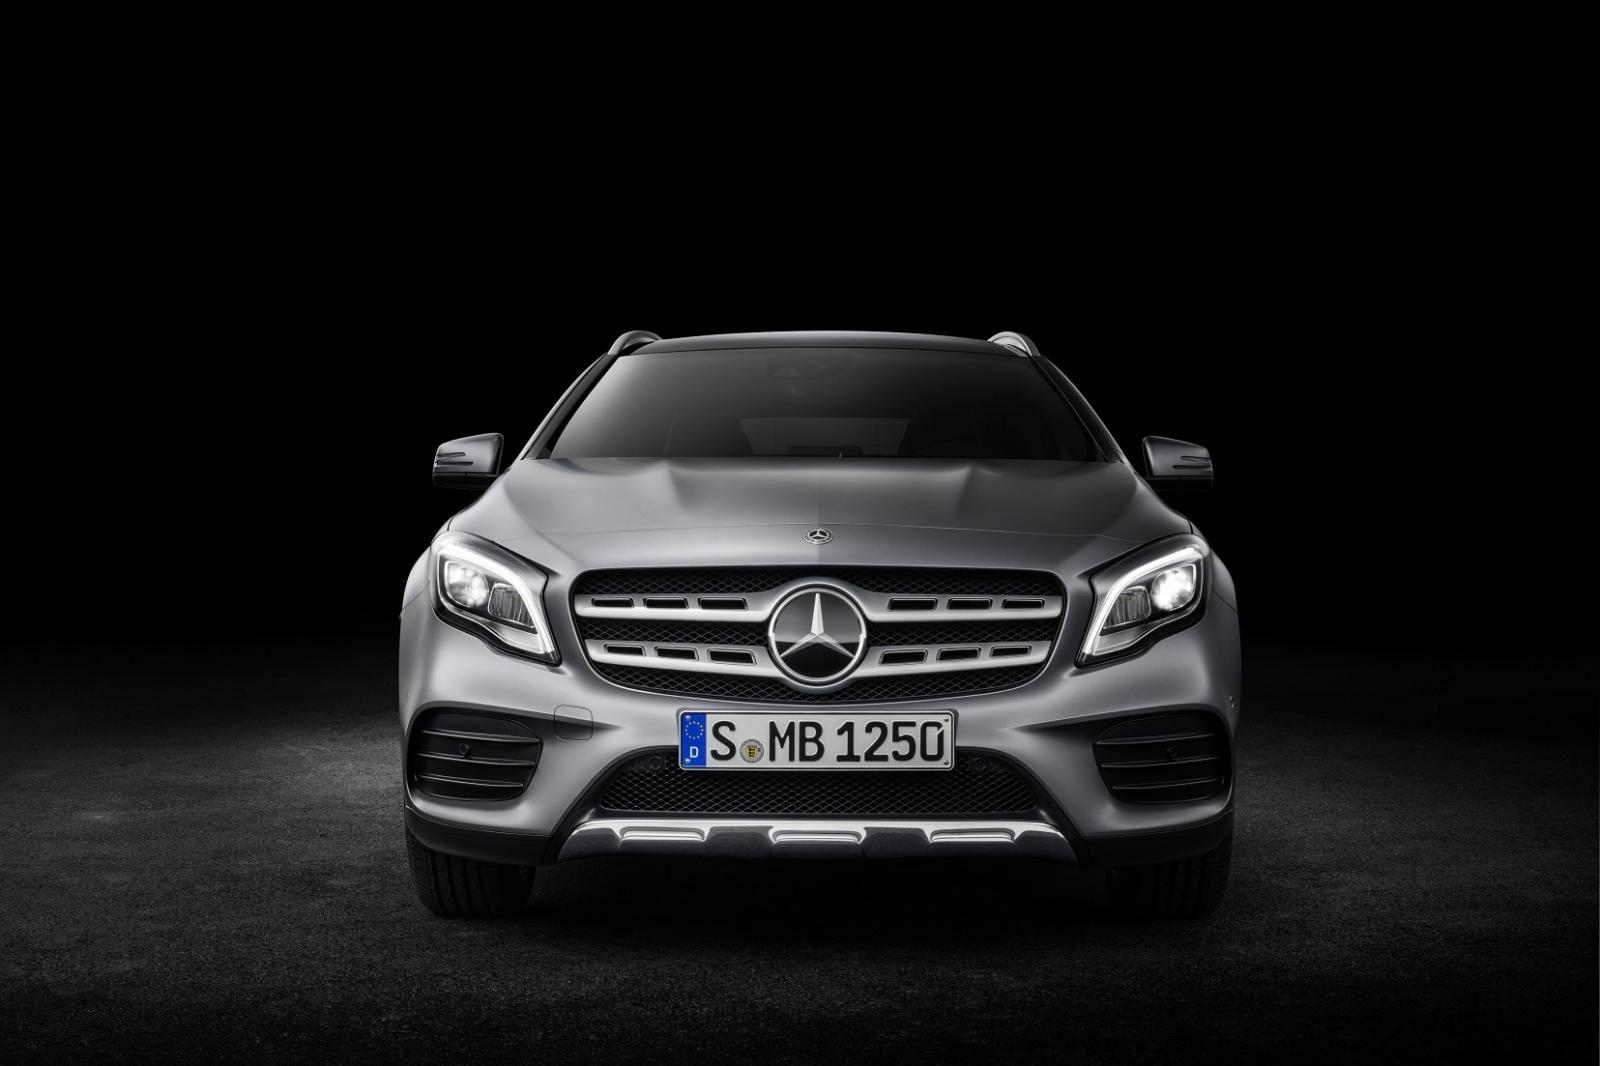 La Mercedes-Benz GLA tiene una apariencia lujosa